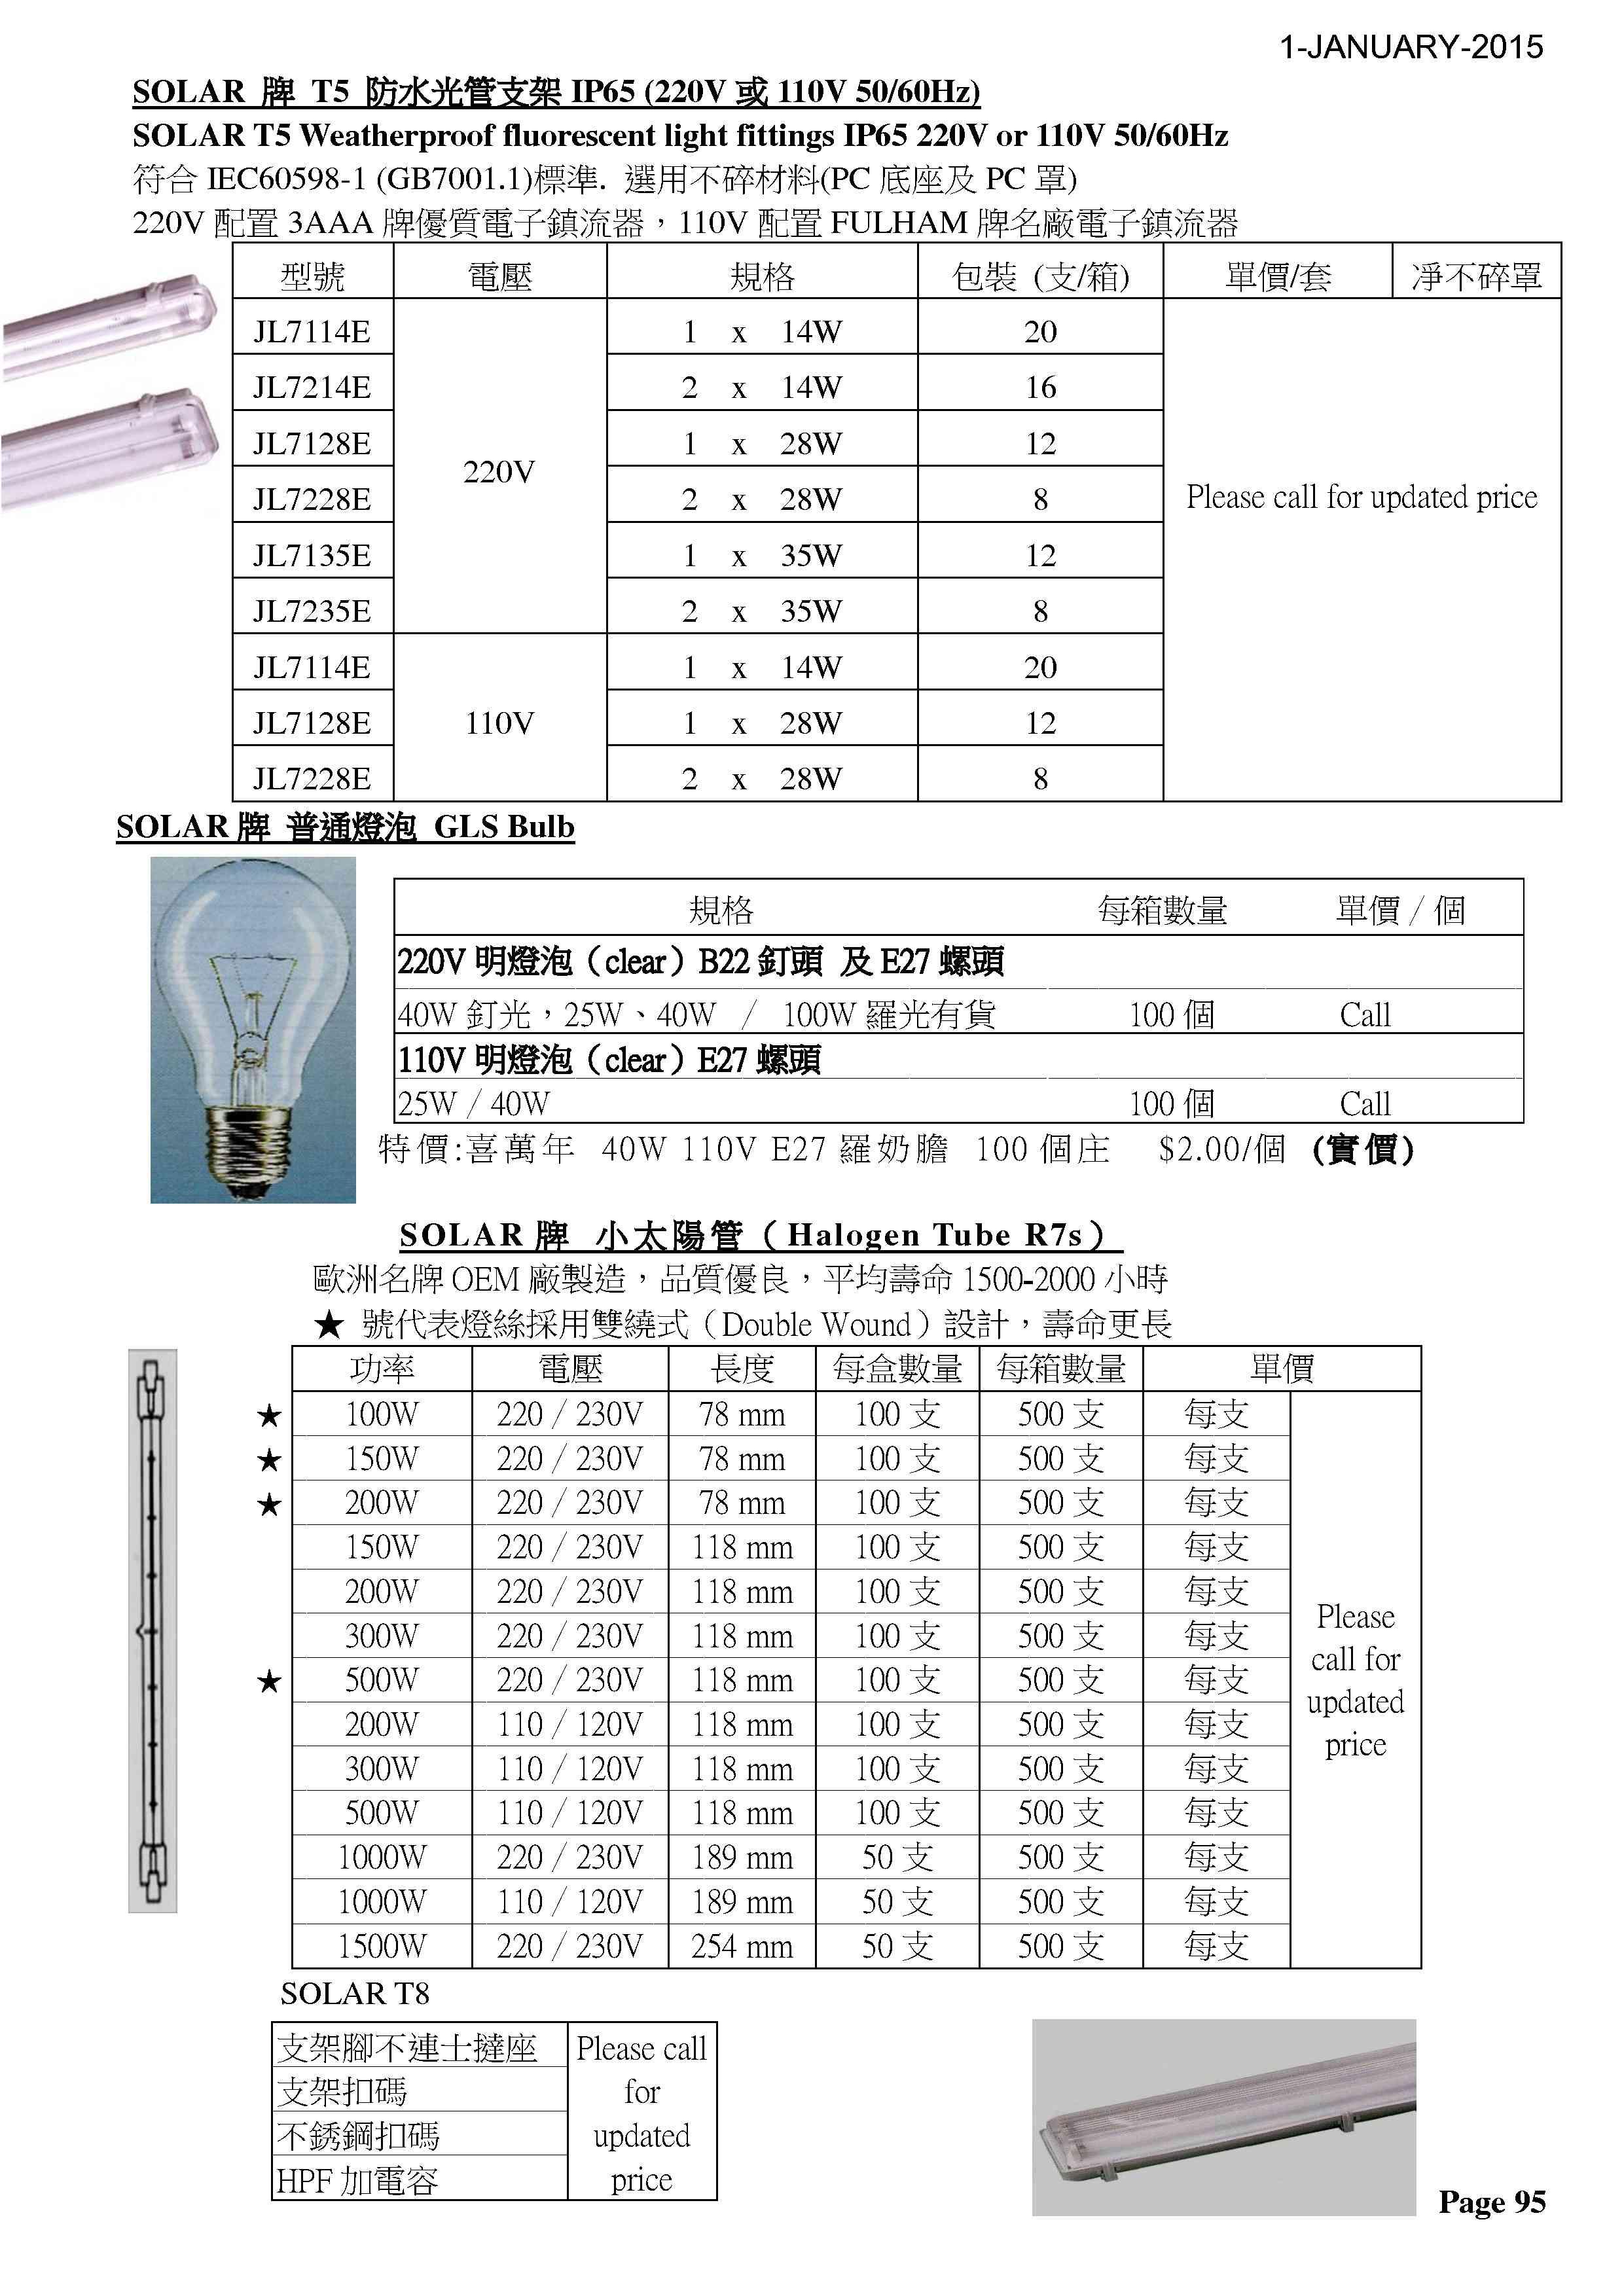 P95 - SOLAR光管1